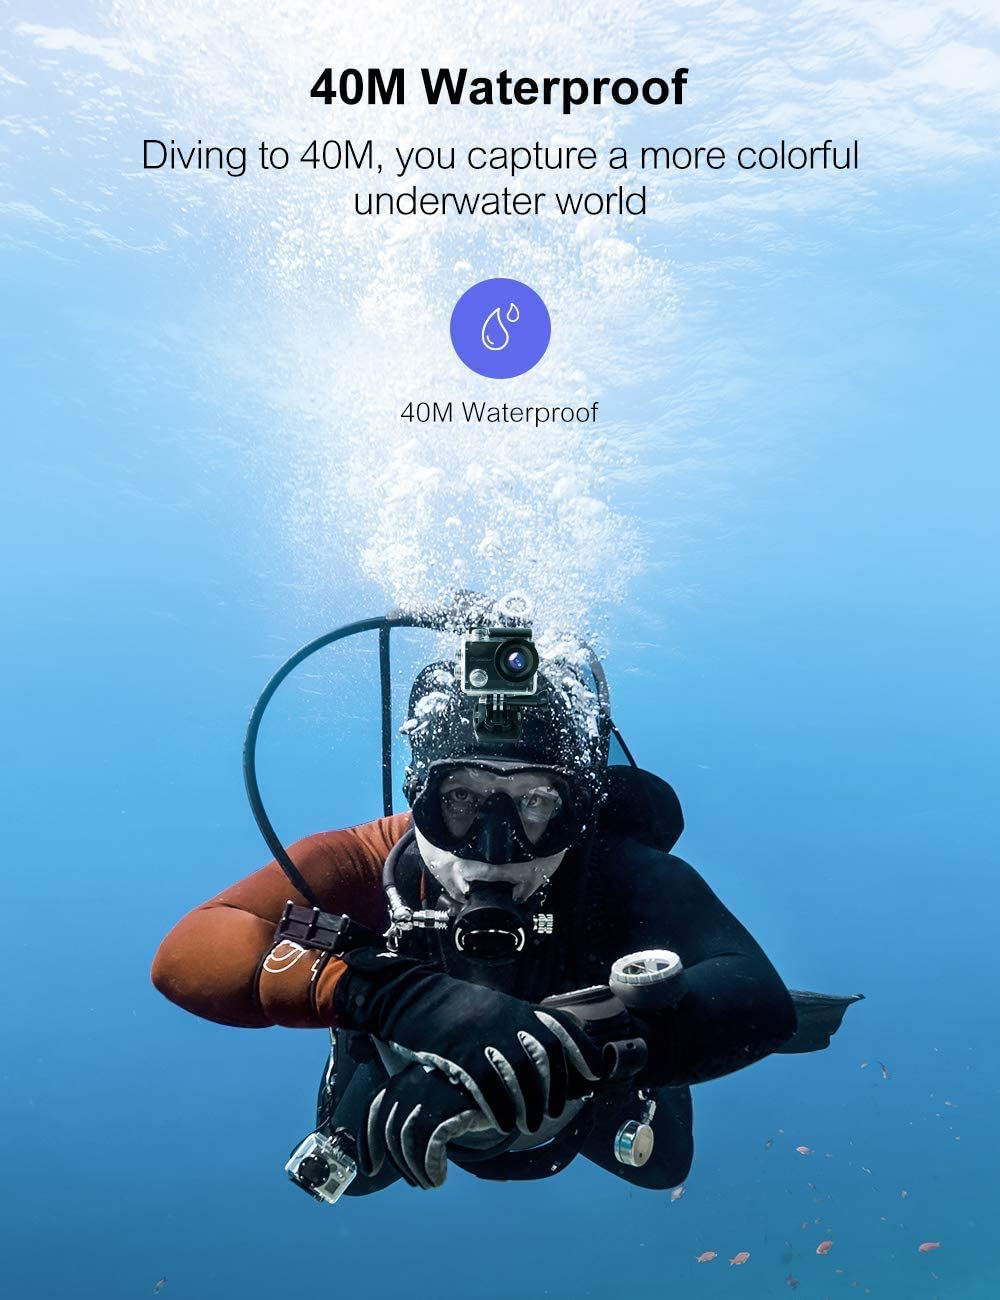 OCEANO 794 C/ámara de Acci/ón DV C/ámara USB 2.0 1080P a Prueba de Agua Pantalla de Alta Definici/ón de 2.0  C/ámara Bajo el Agua C/ámara Deportiva Gran Angular de 140 /° Bater/ía Incorporada de 900 mAh